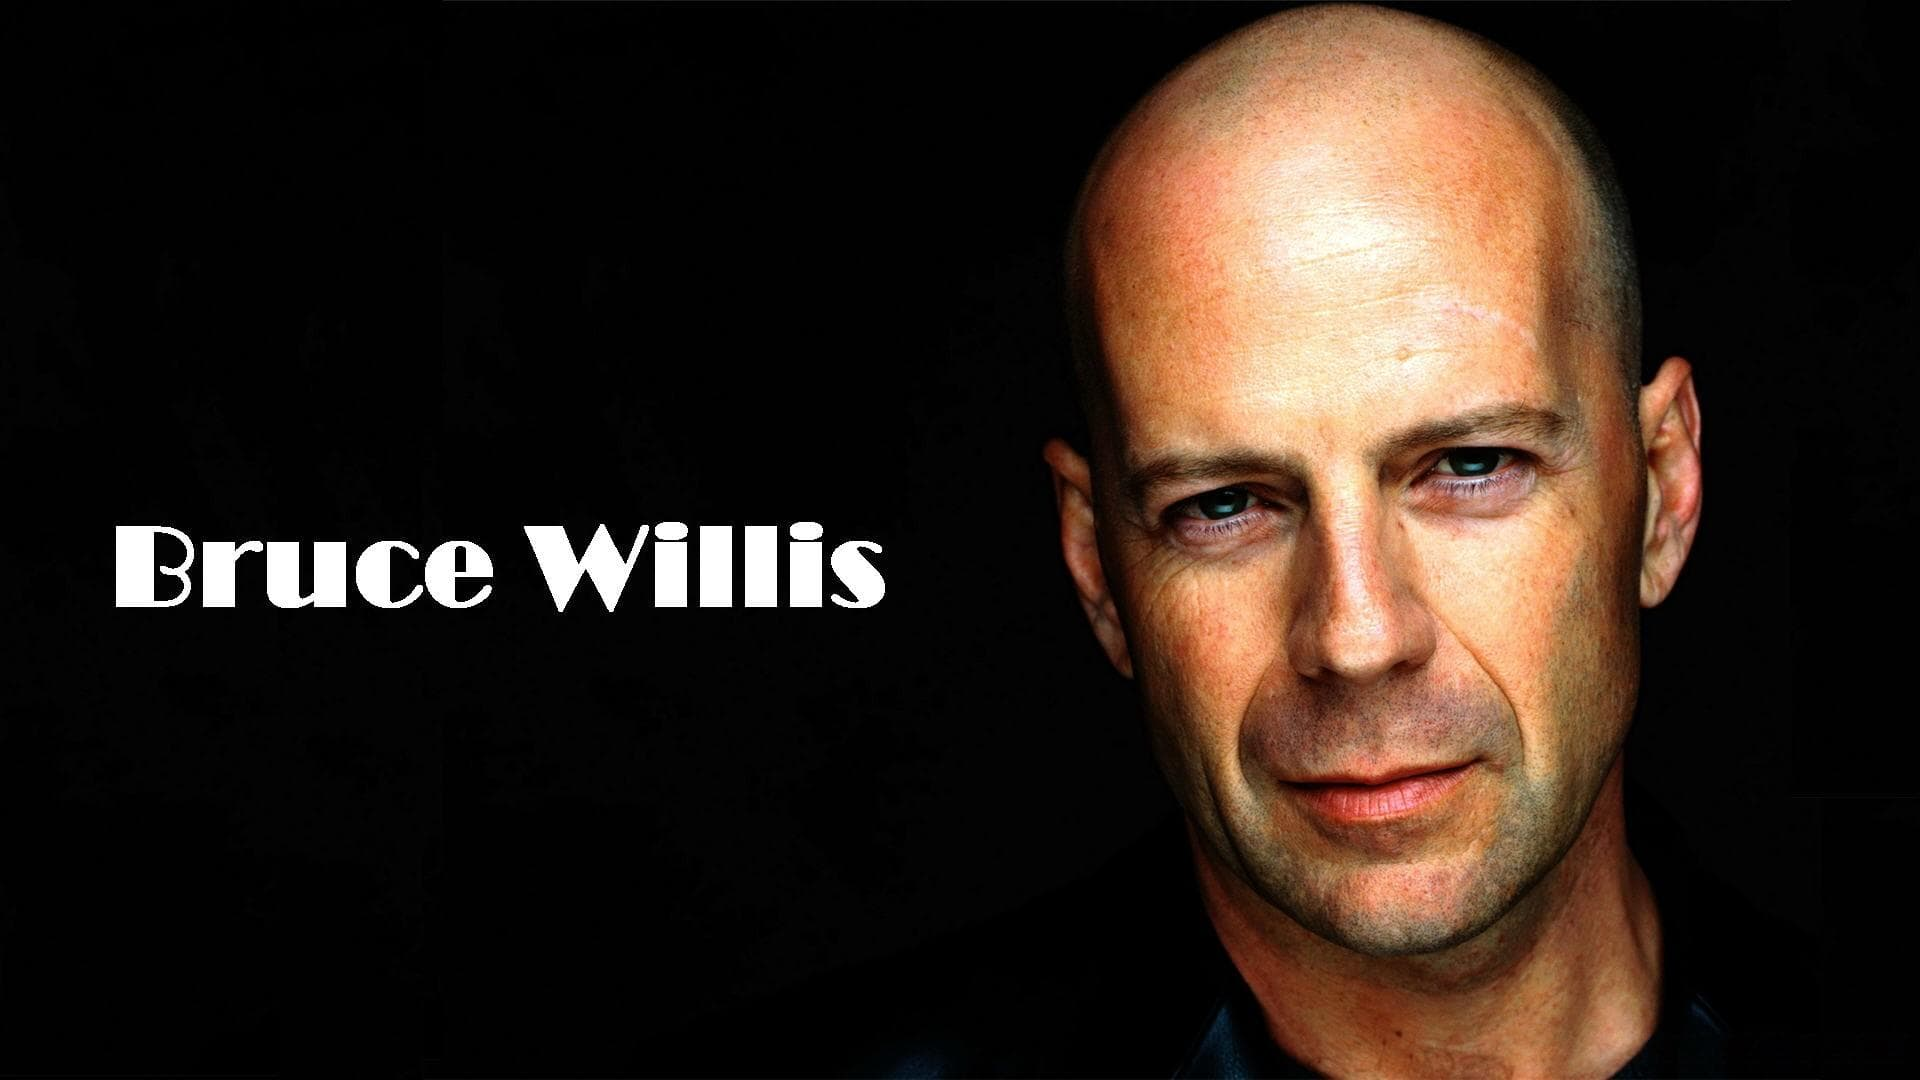 Bruce Willis Backgrounds